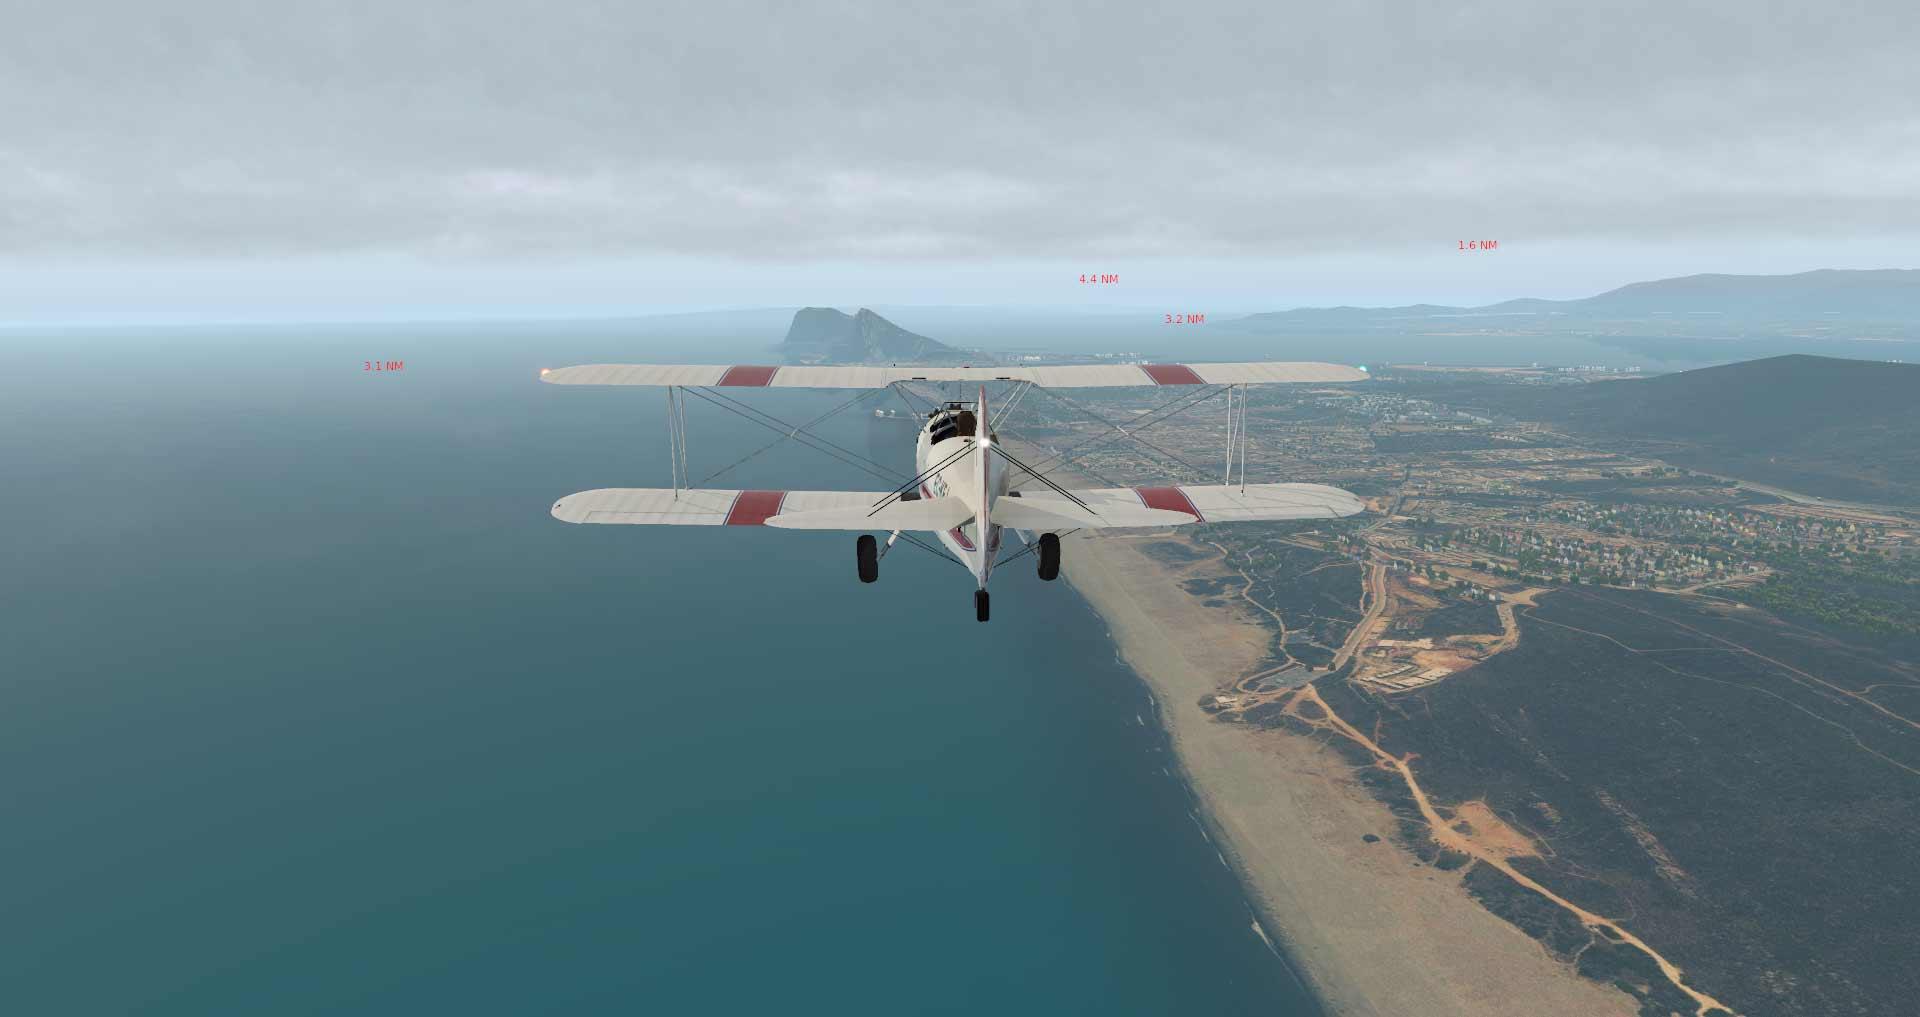 C.R. FSX-France Air Vintage - étape 9 Bm1m0